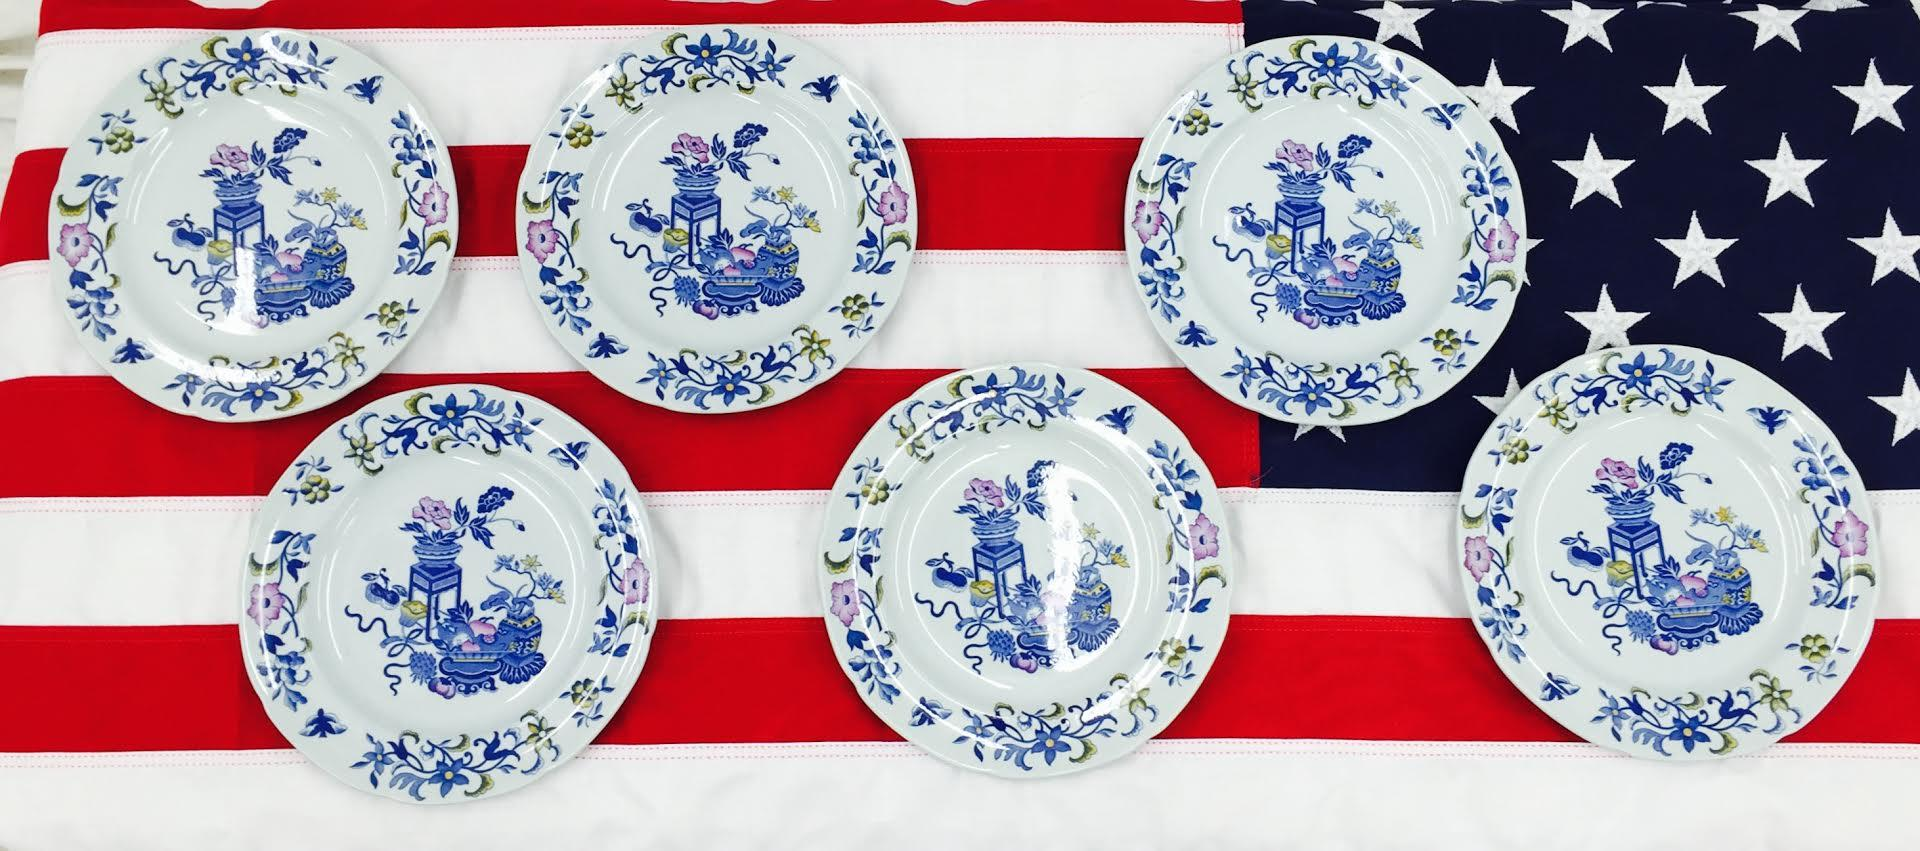 Vintage English Spode Blue Bowpot Porcelain Plates 6  : vintage english spode blue bowpot porcelain plates 6 8358aspectfitampwidth640ampheight640 from www.chairish.com size 640 x 640 jpeg 55kB